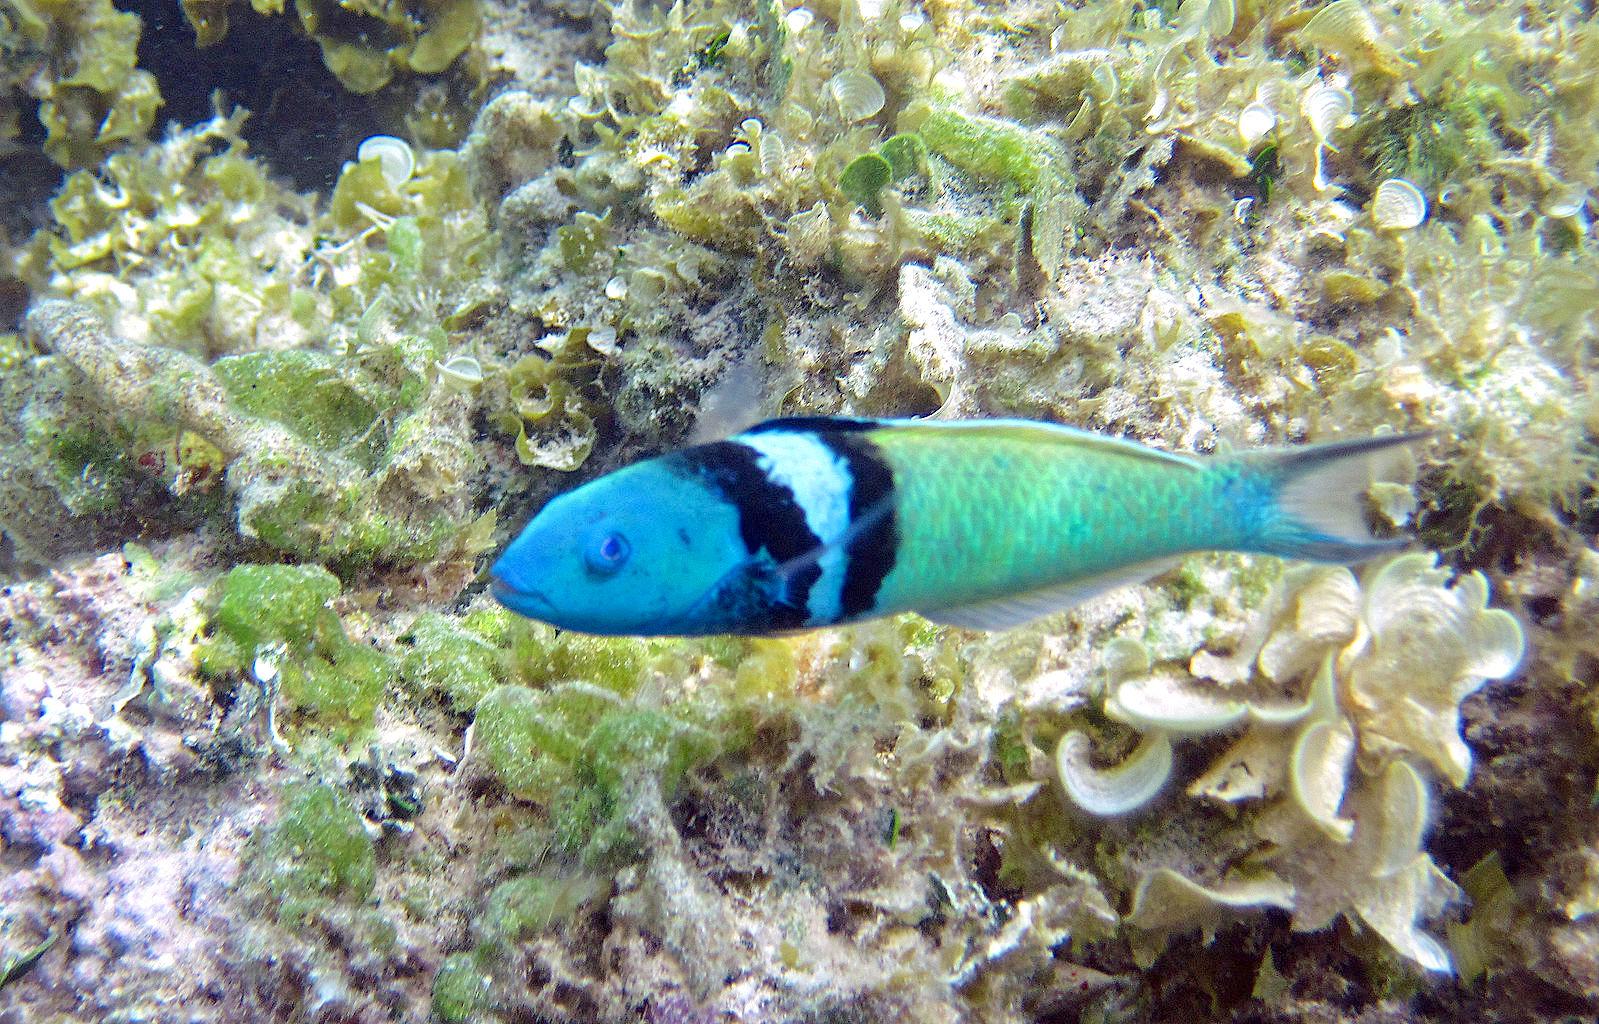 thalassoma_bifasciatum_bluehead_wrasse_san_salvador_island_bahamas-james-st-john-wiki